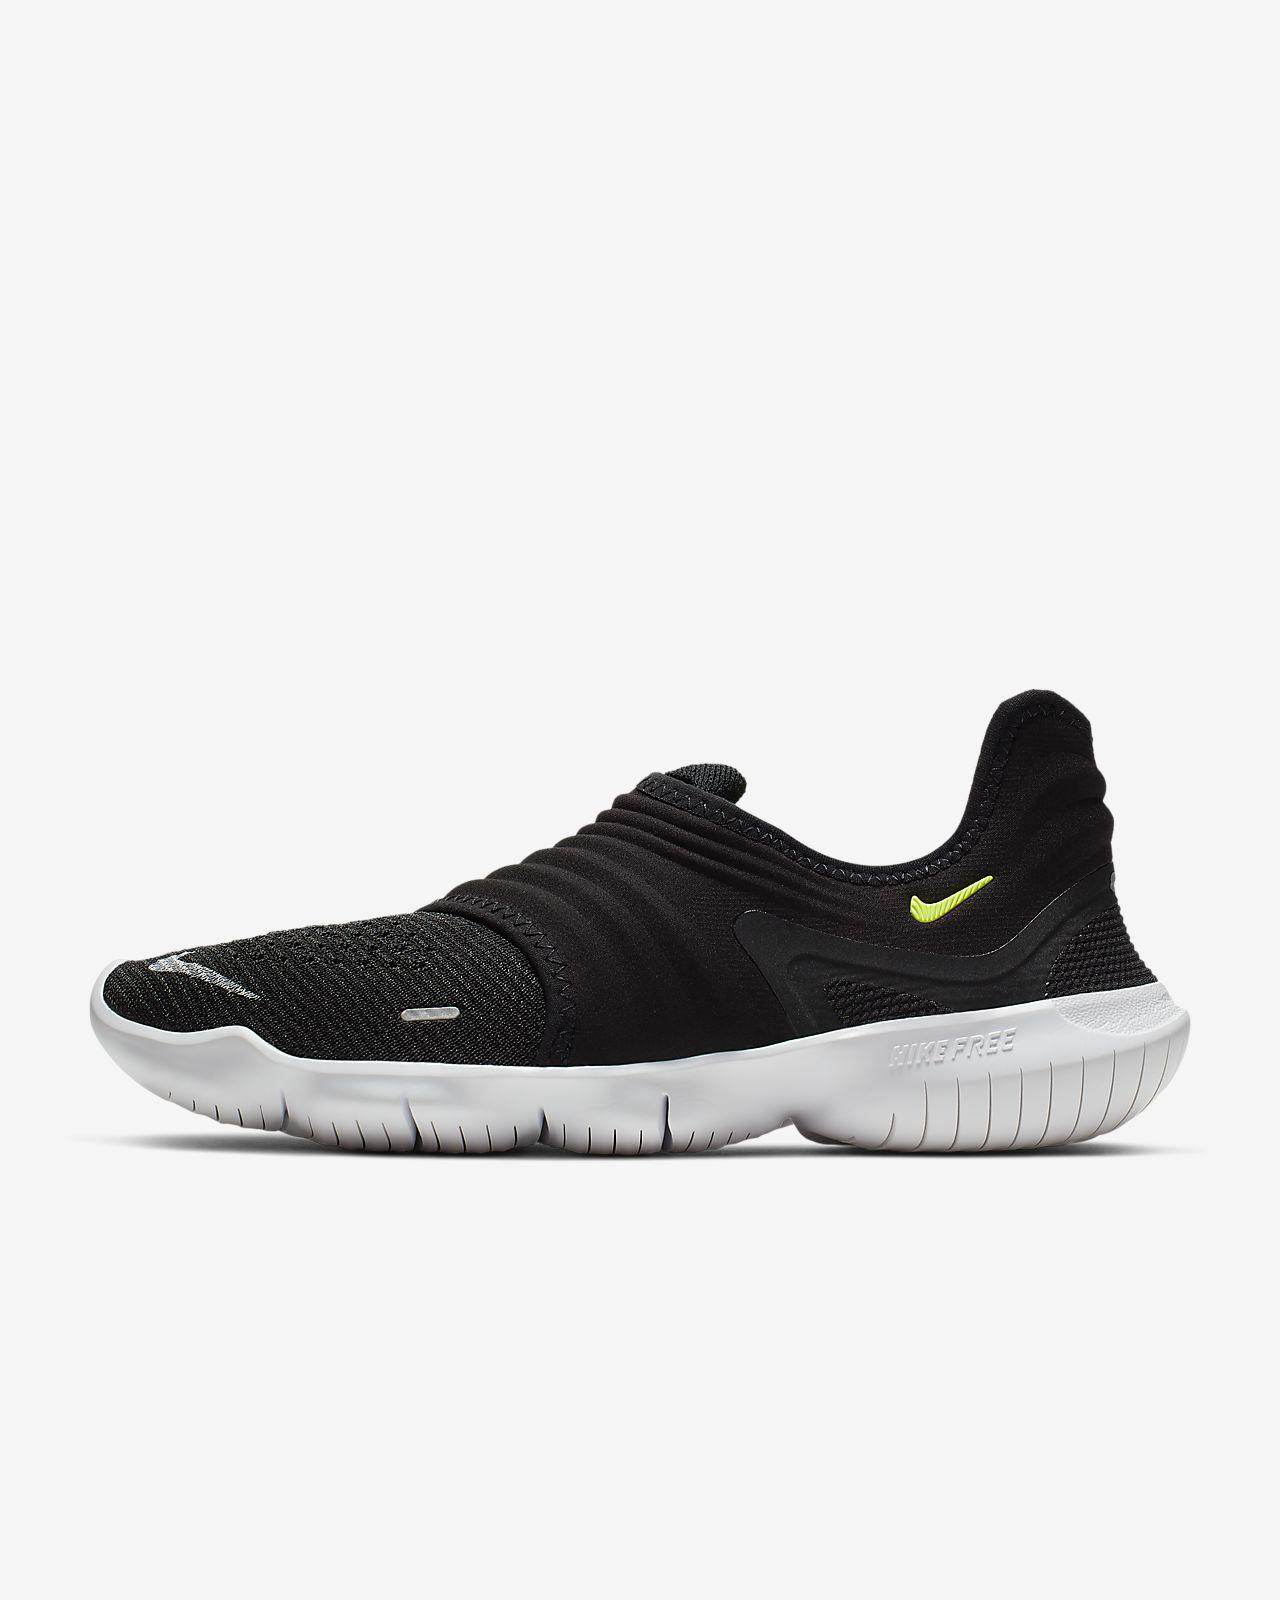 Nike Free RN Flyknit 3.0 女款跑鞋